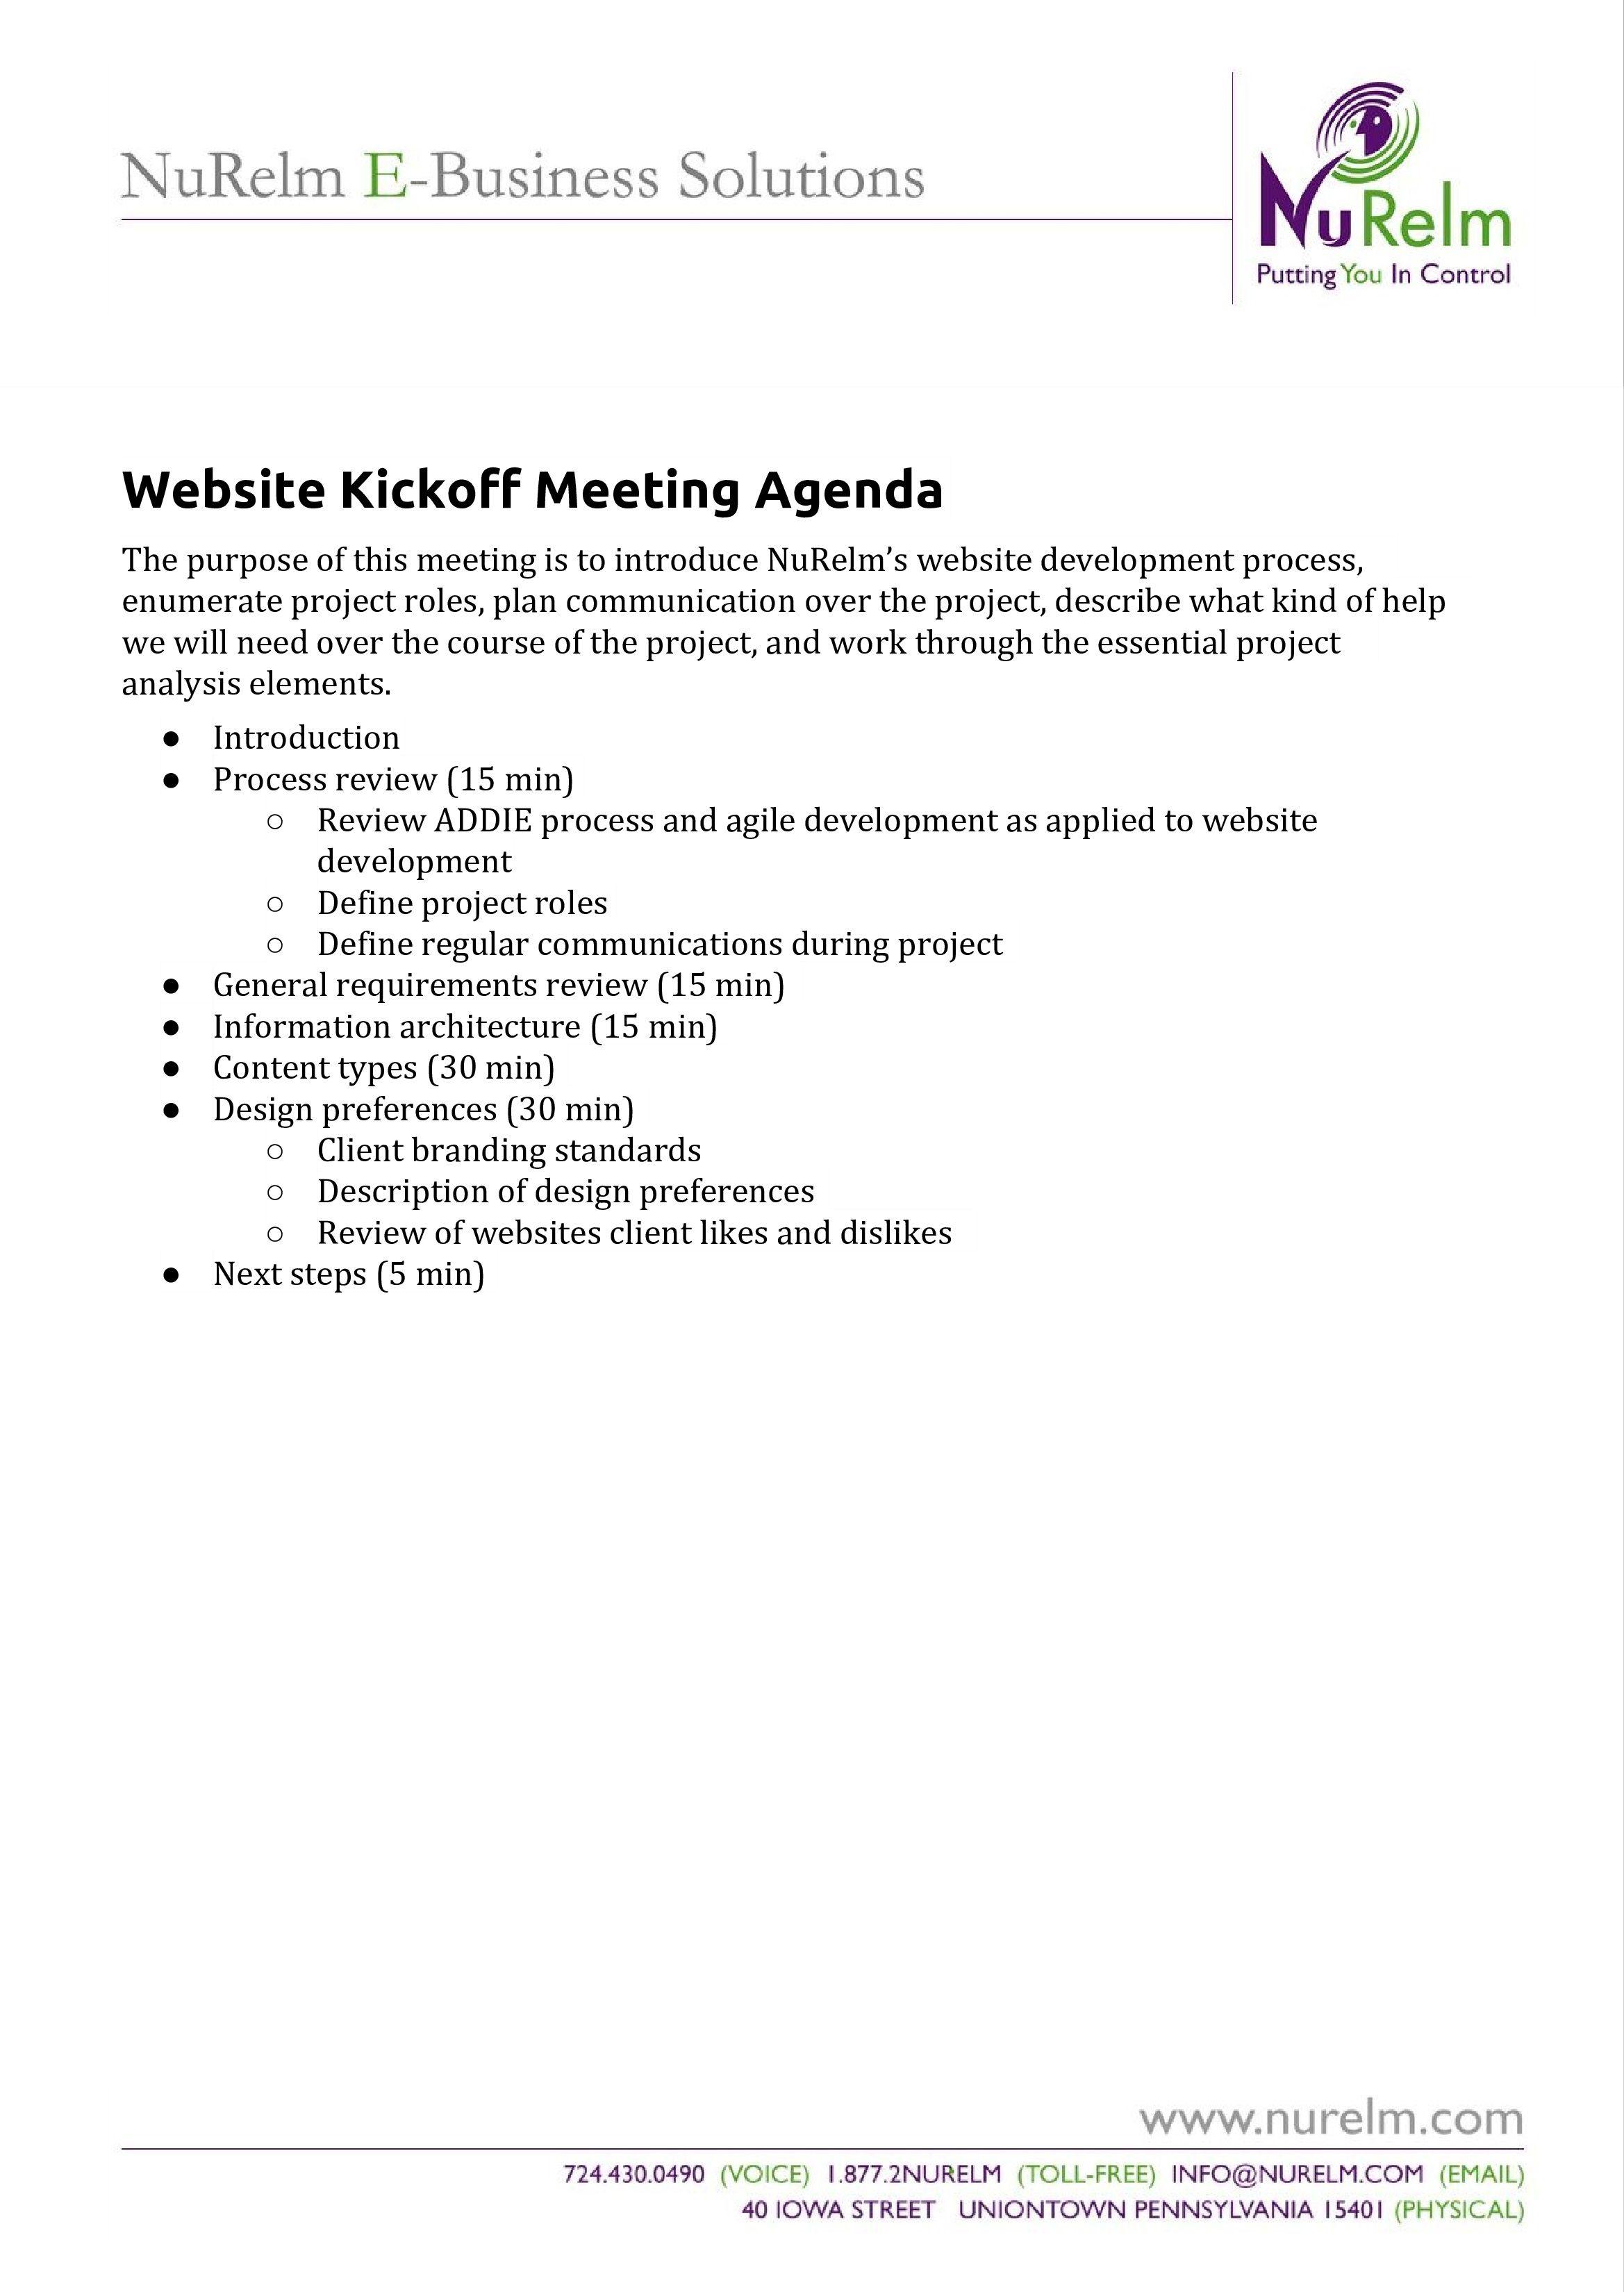 003 Singular Kick Off Meeting Template Concept  Invitation Email Agenda Project ManagementFull